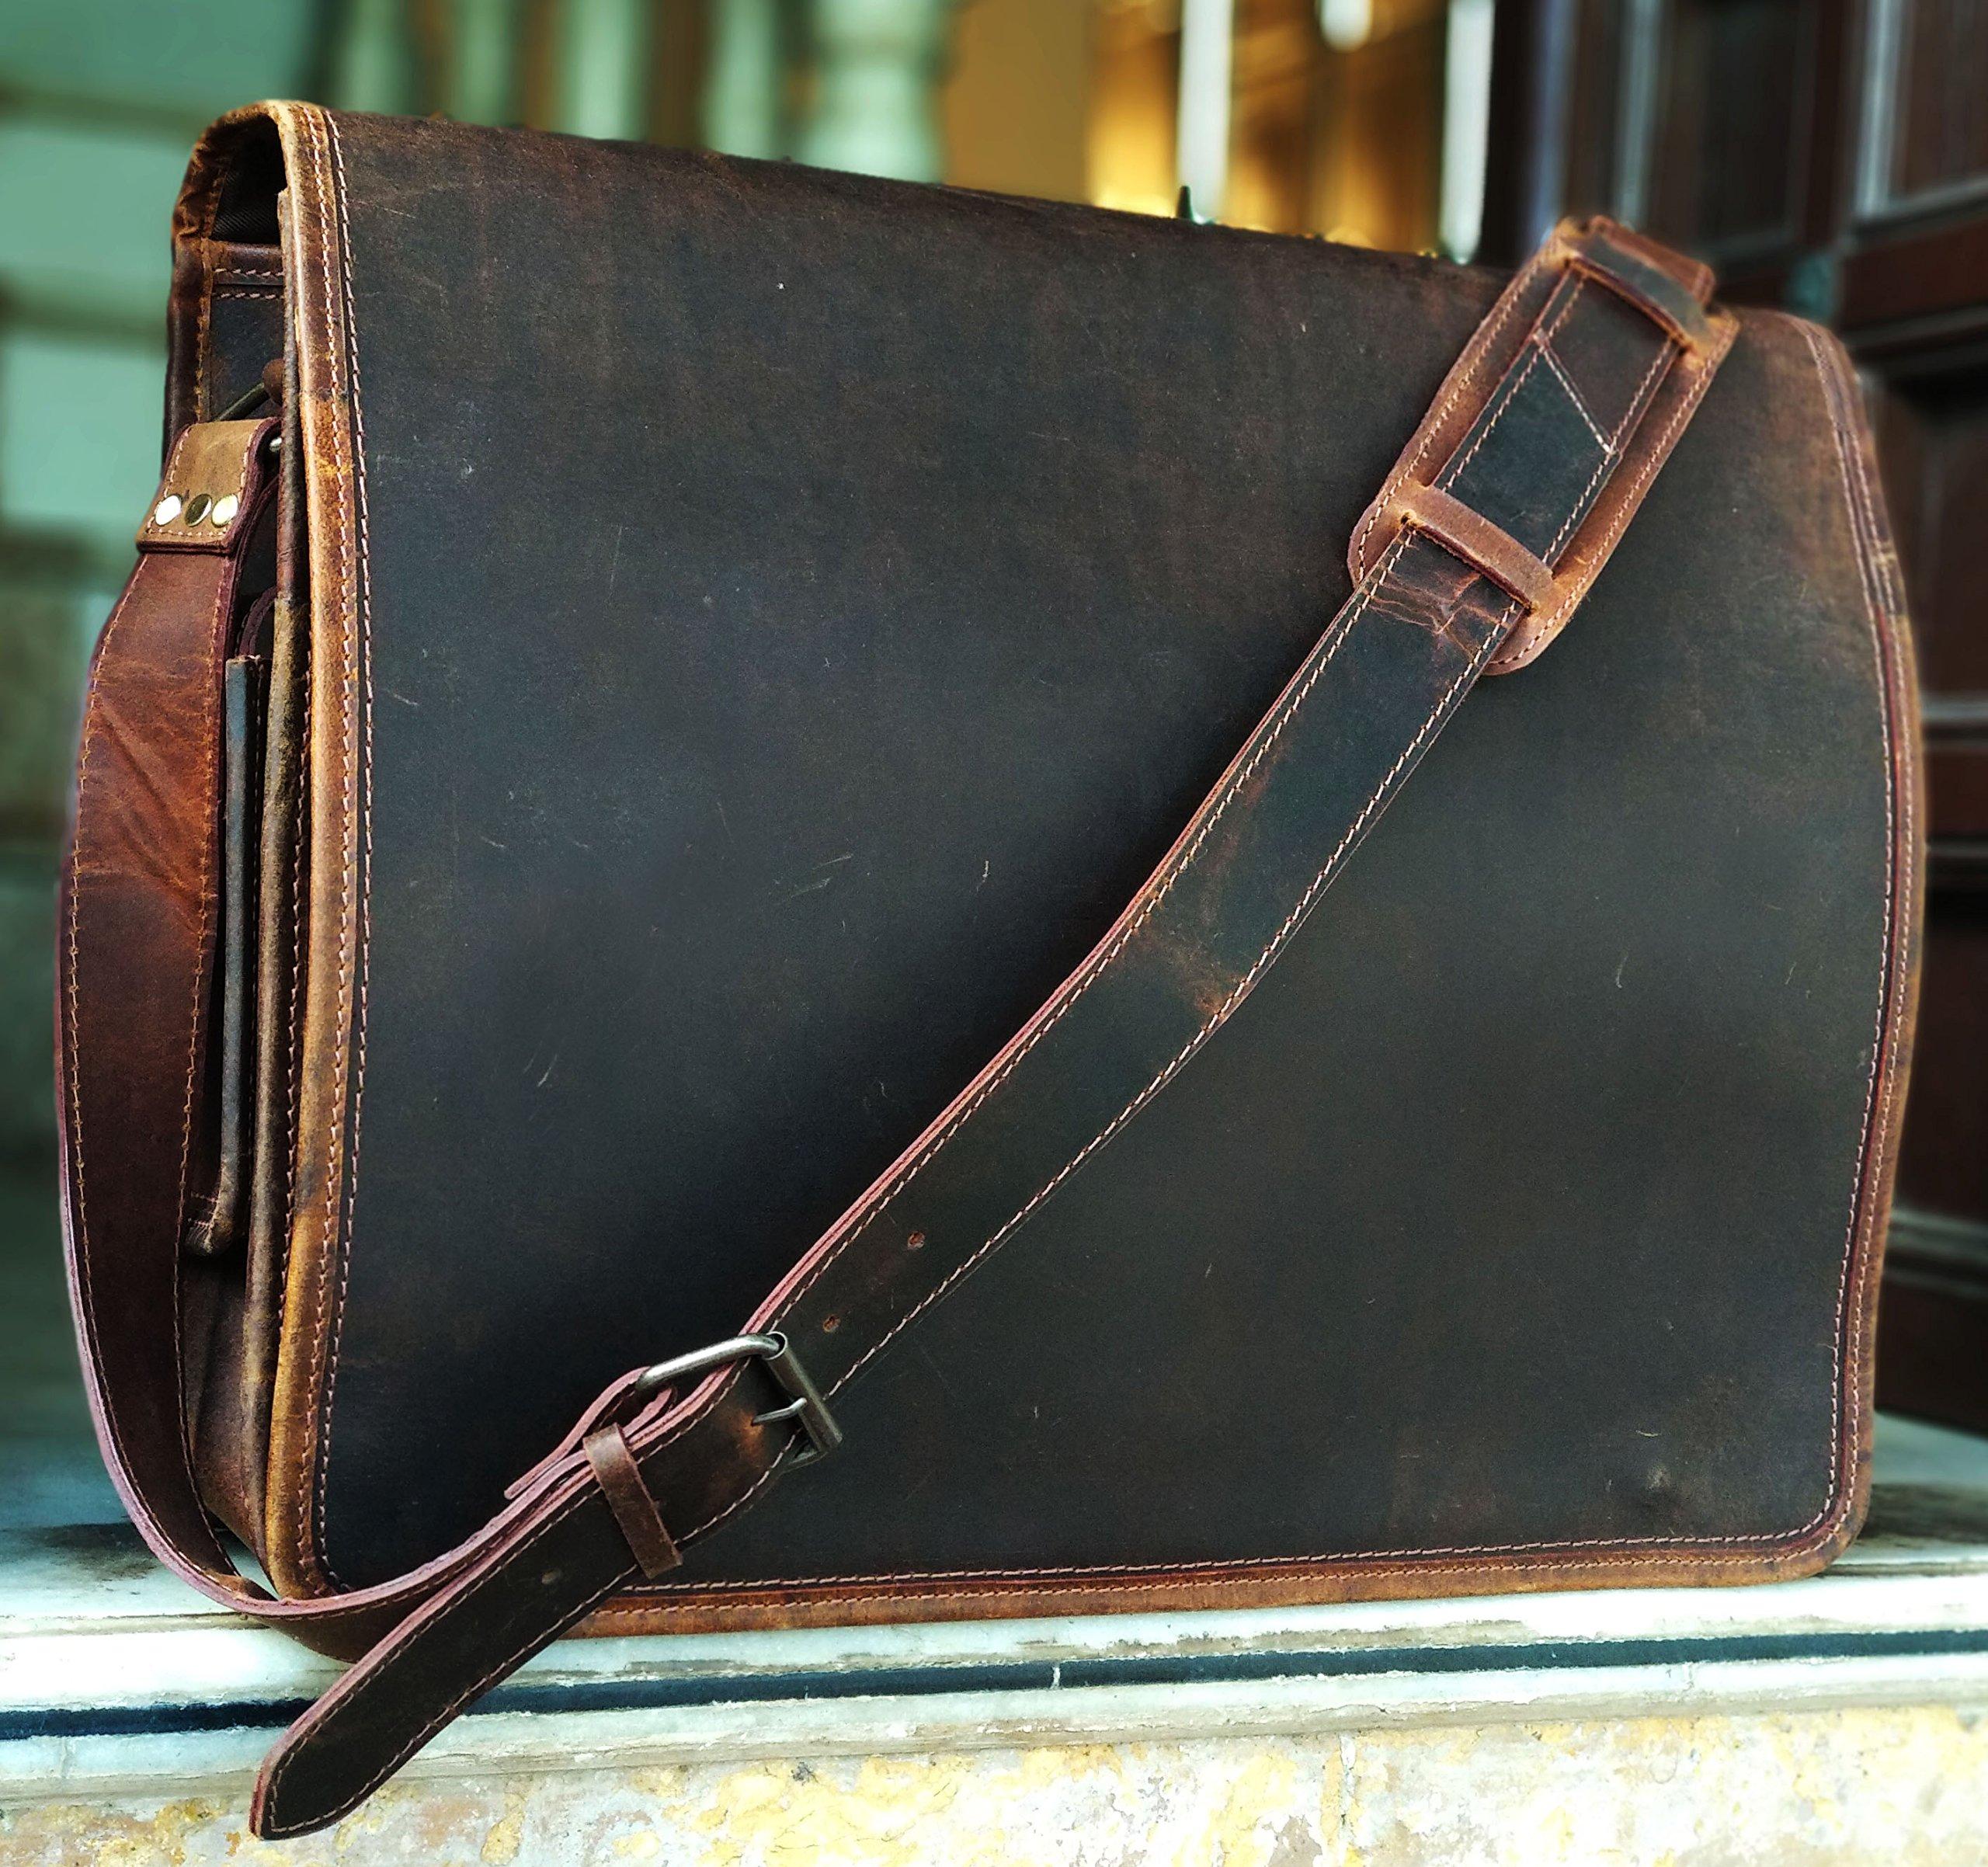 16 Inch Leather Vintage Rustic Crossbody Messenger Courier Satchel Bag Gift Men Women ~ Business Work Briefcase Carry Laptop Computer Book Handmade Rugged & Distressed By KK's Leather by kk's leather (Image #2)